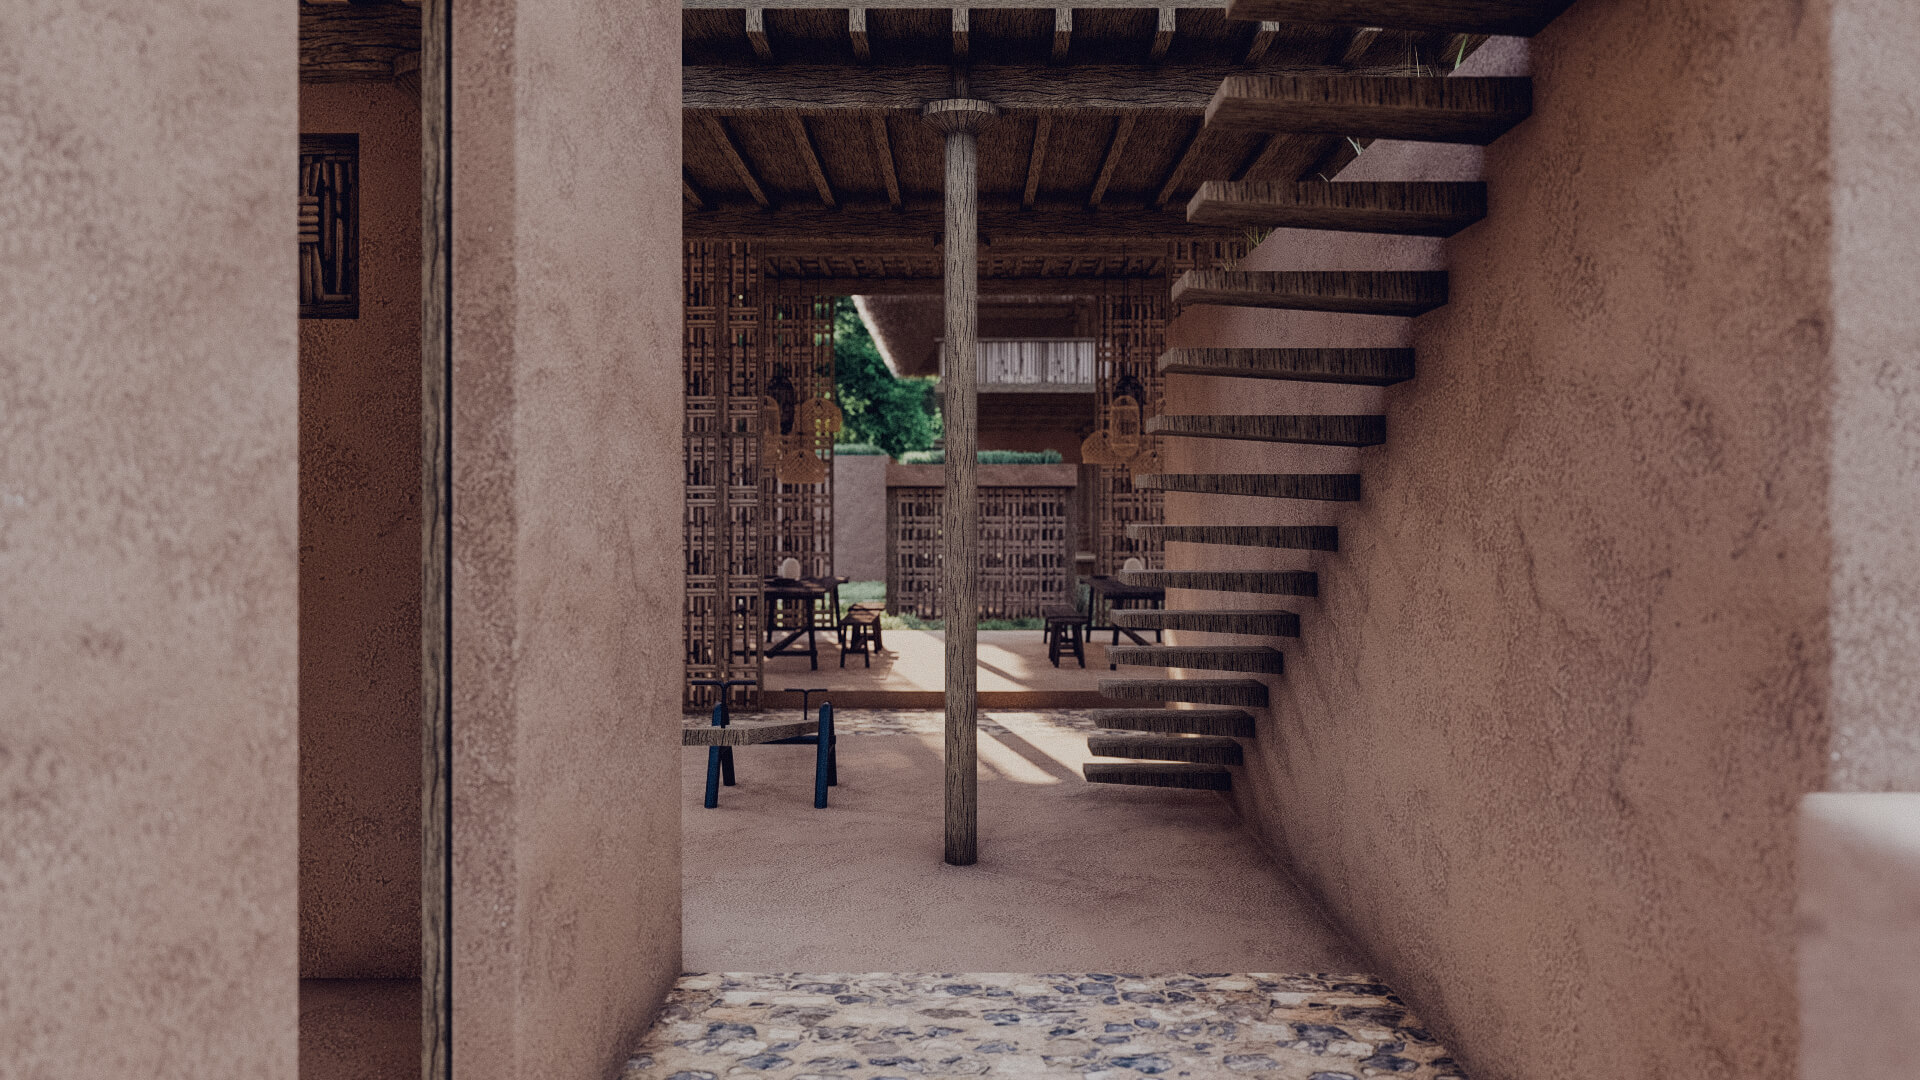 Rumah Besar Sembalun Lombok Architecture Corridor